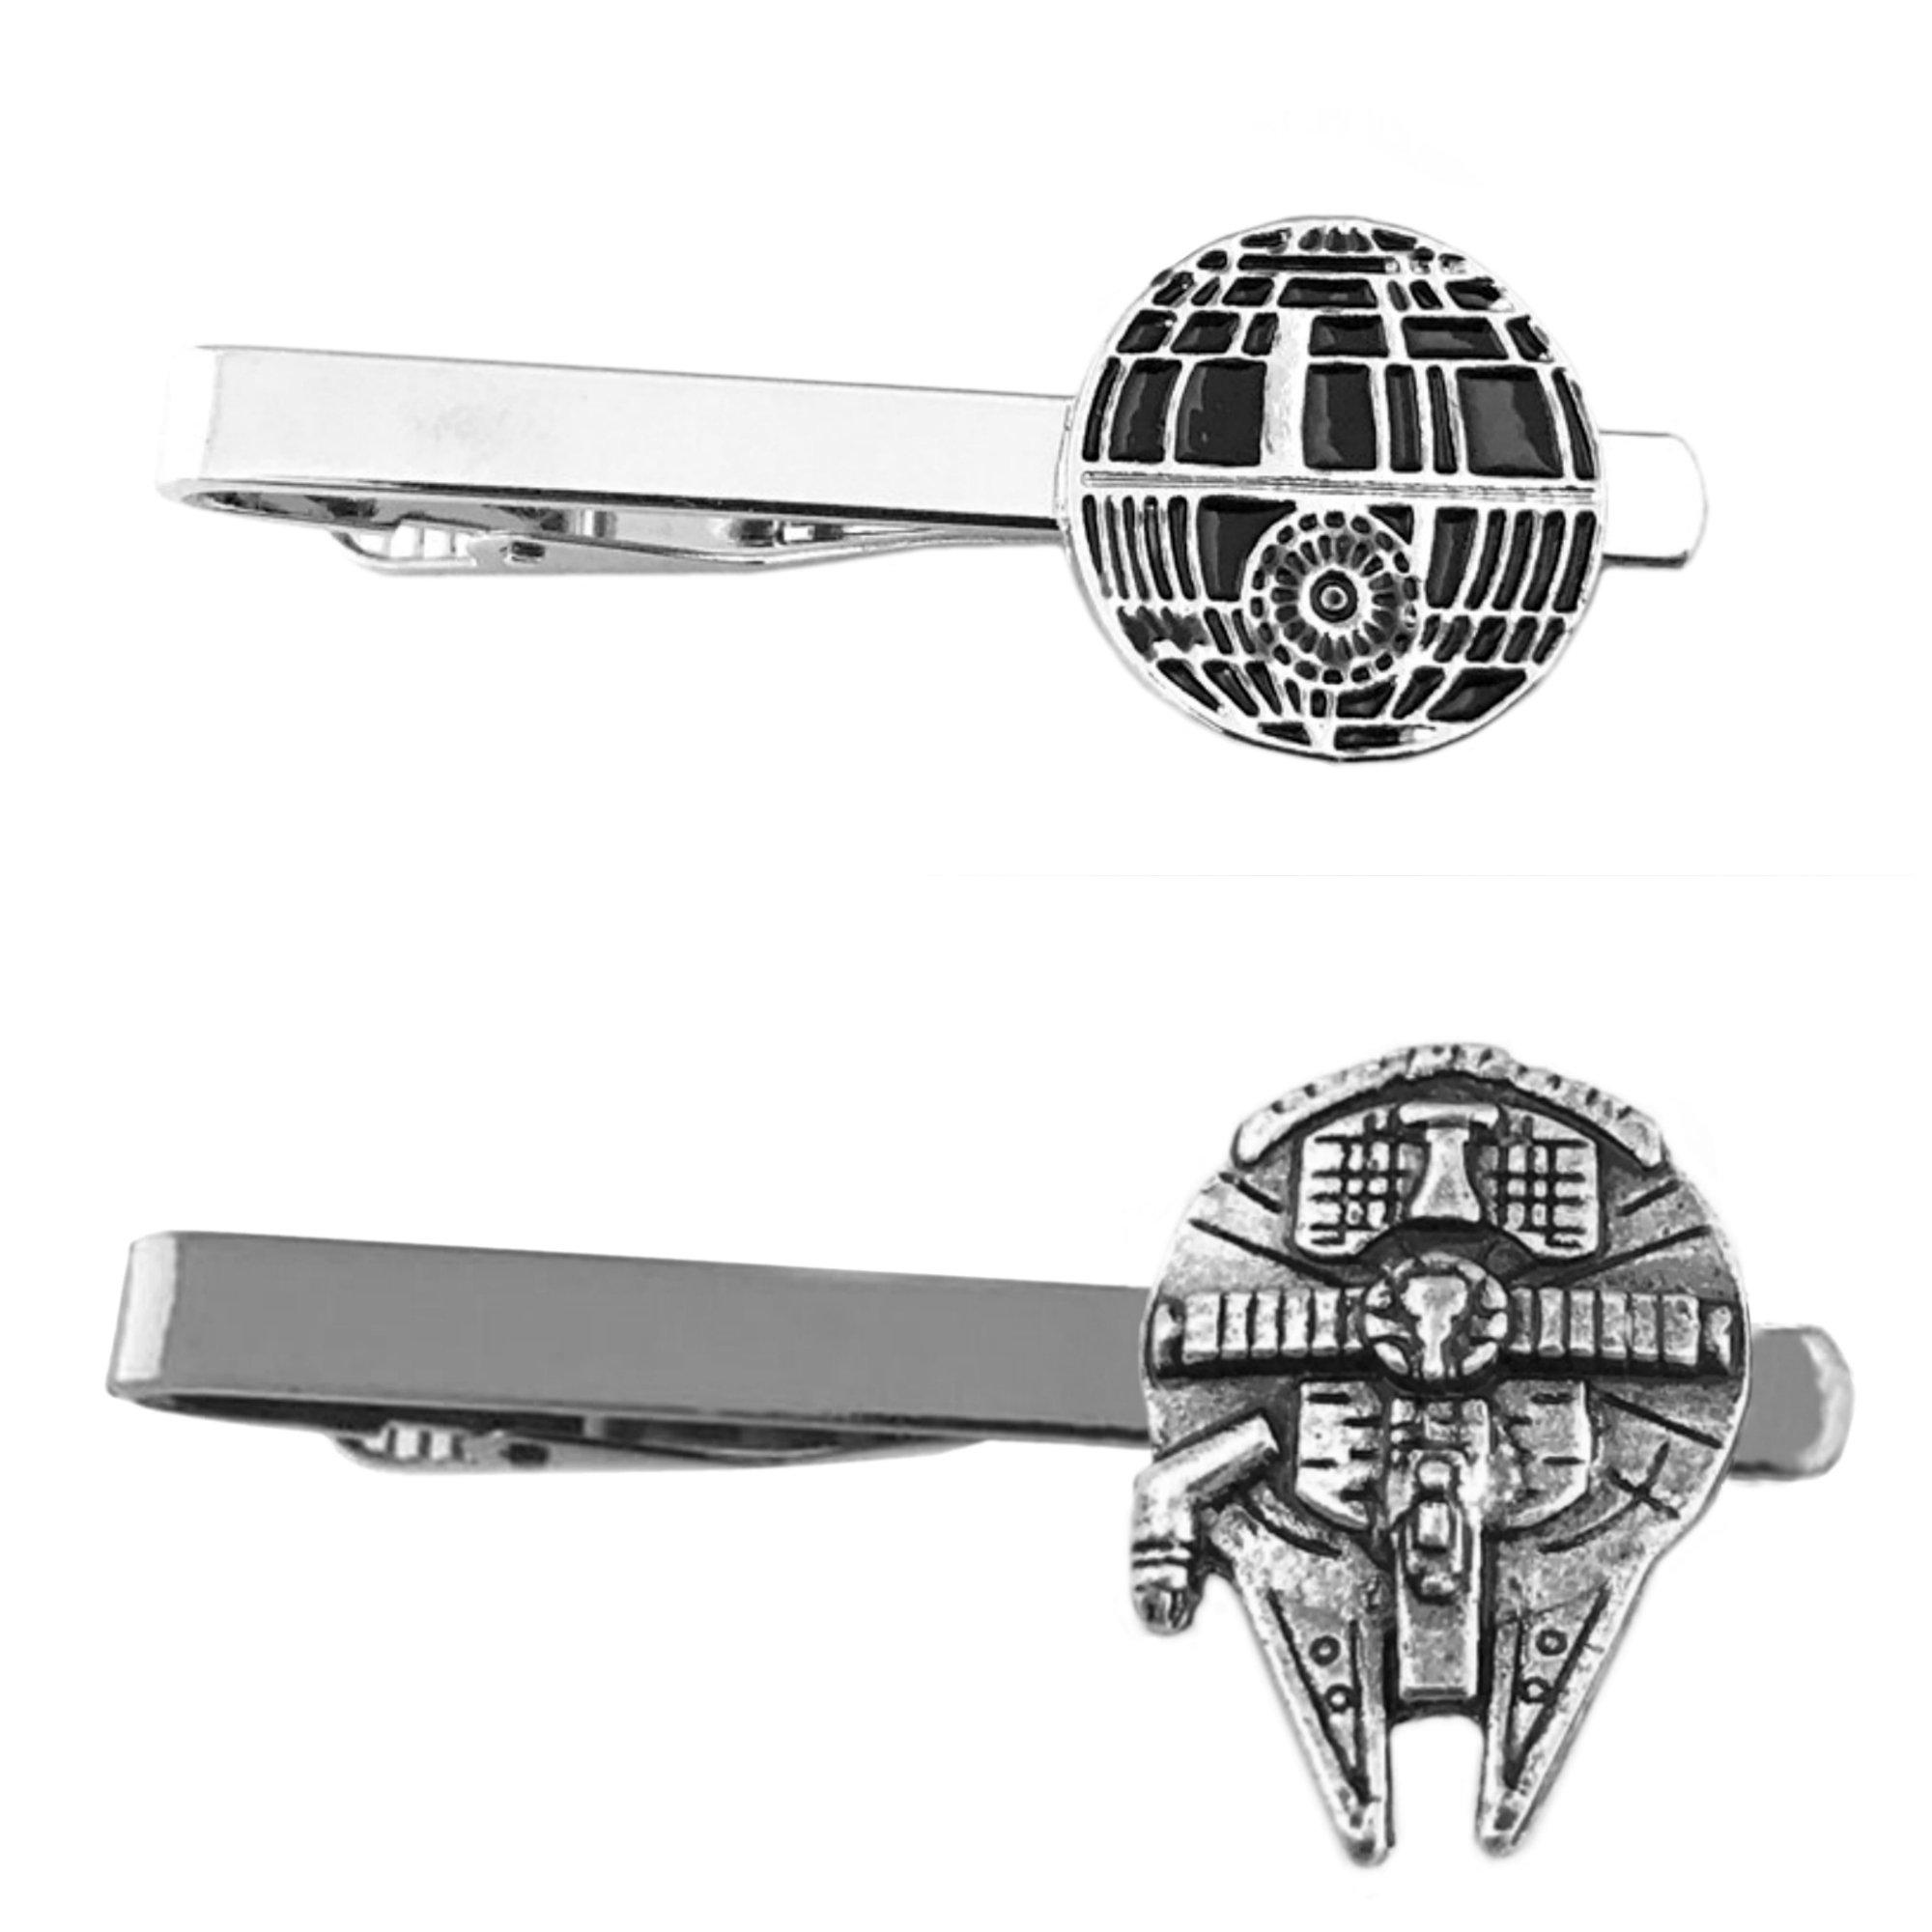 Outlander Star Wars - Death Star & Millenium Falcon - Tiebar Tie Clasp Set of 2 Wedding Superhero Logo w/Gift Box